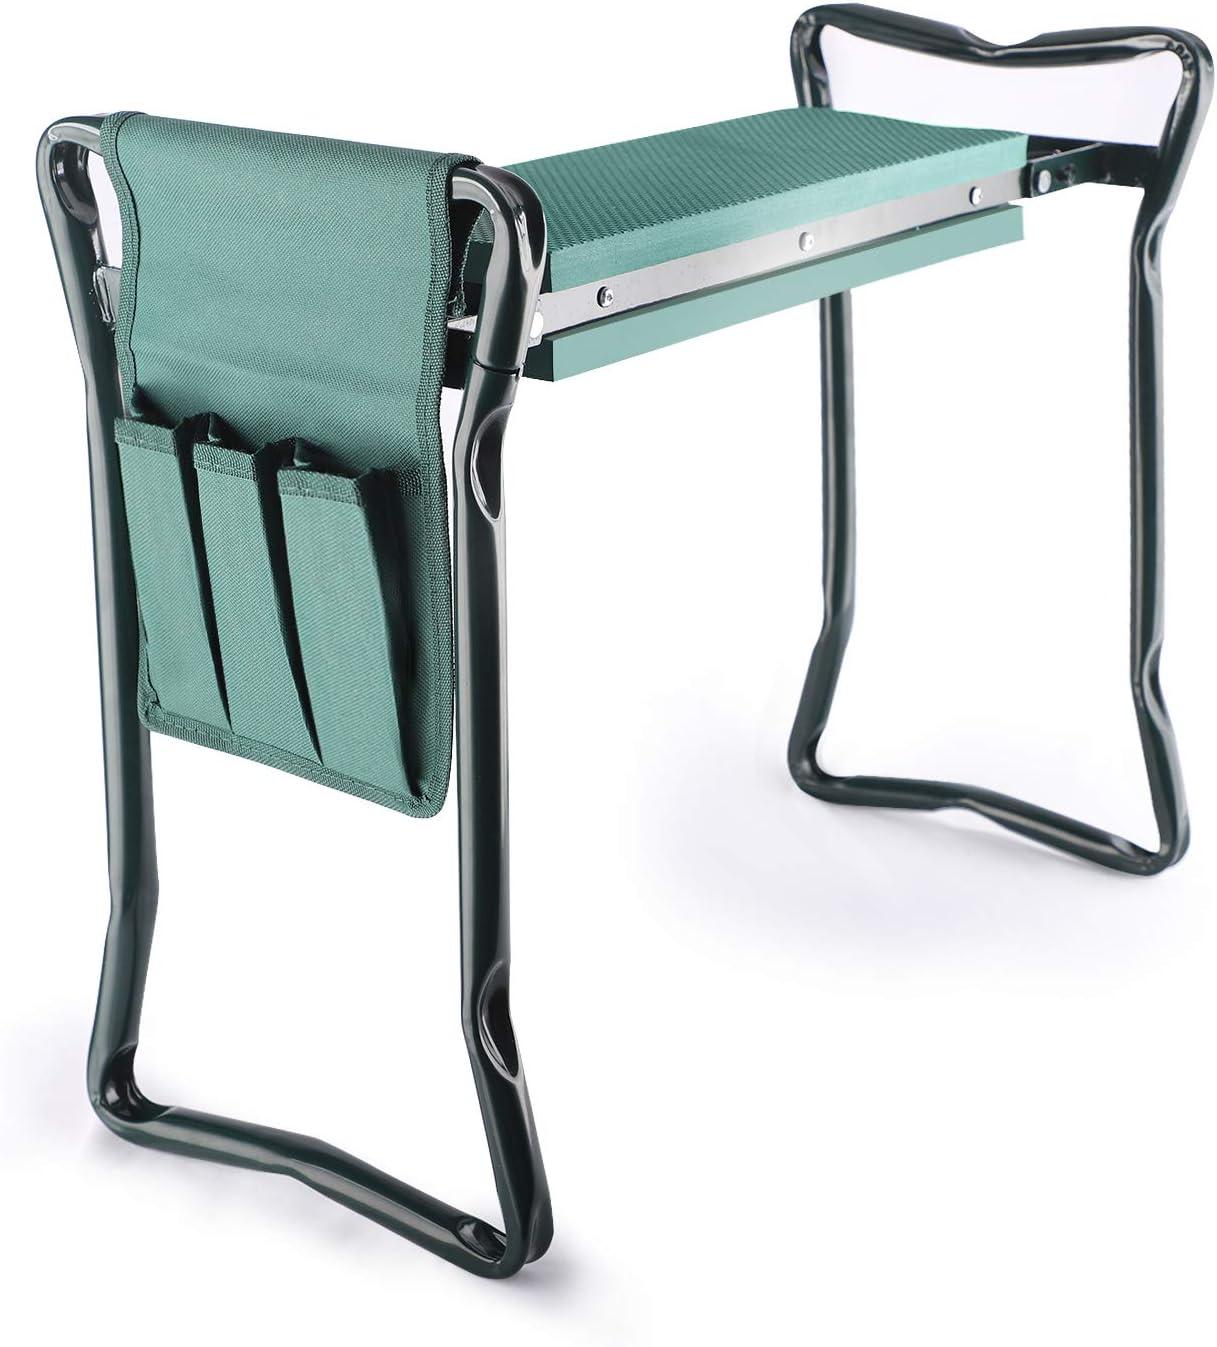 DEKOOL Garden Kneeler and Seat with Tool Pouch, 2 in 1 Foldable Garden Bench with Soft EVA Foam Kneeling Pad, Portable Kneeler Seat for Gardening, Outdoor Garden Stool